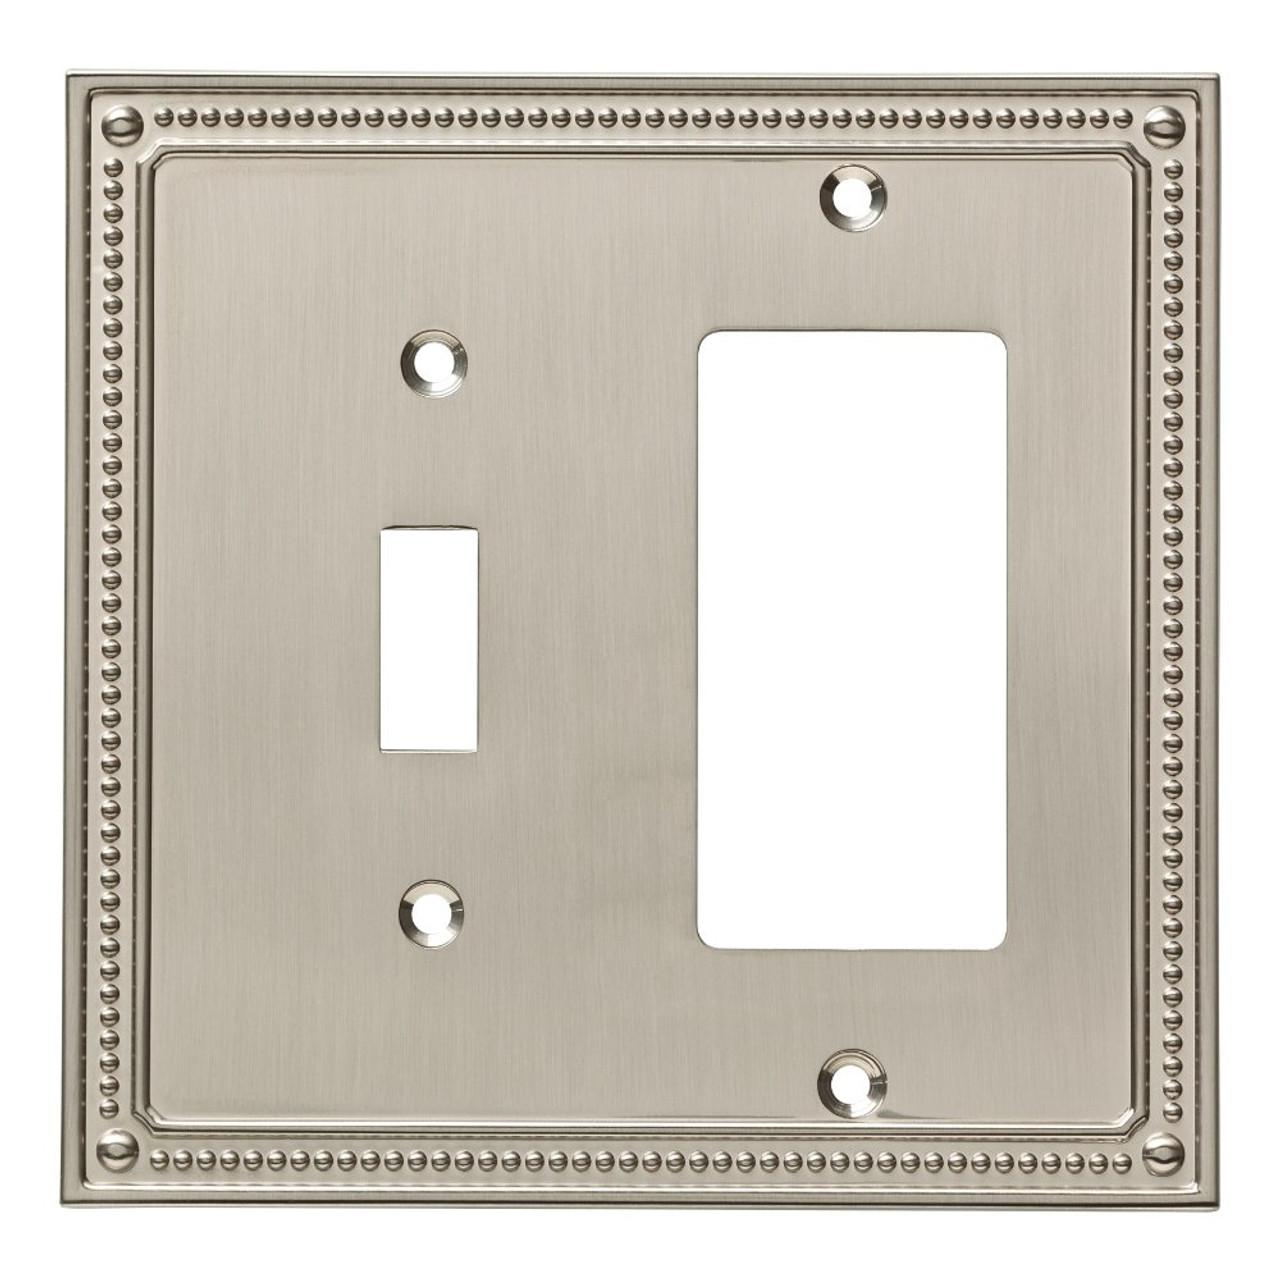 Franklin Brass W35063-SN Classic Beaded Switch / GFCI Decora Cover Plate